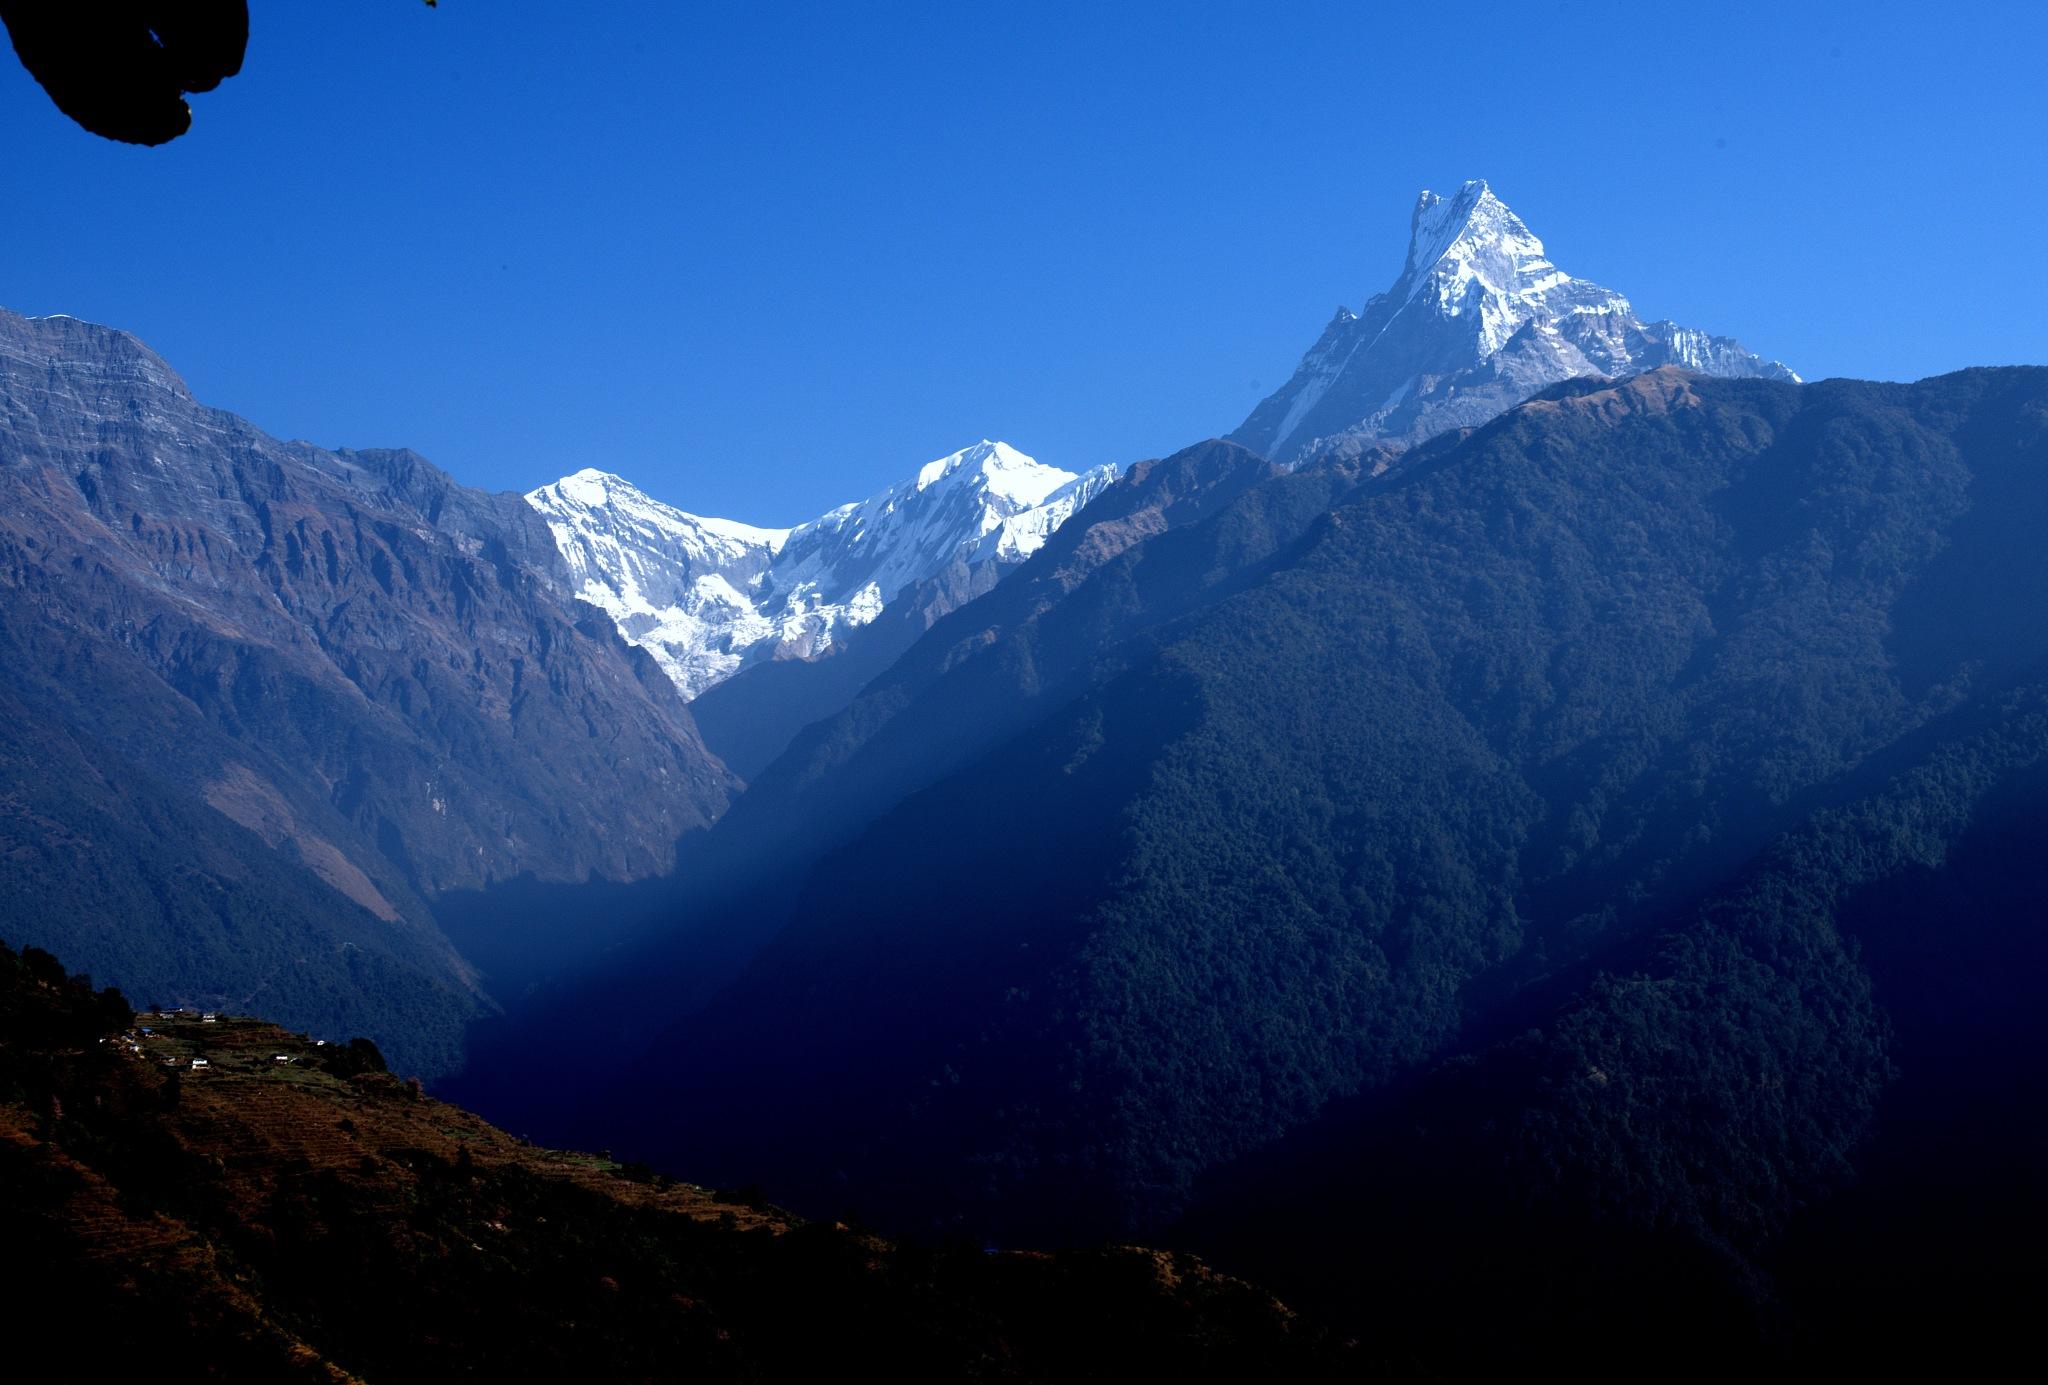 Landscape by Bhusan Suwal